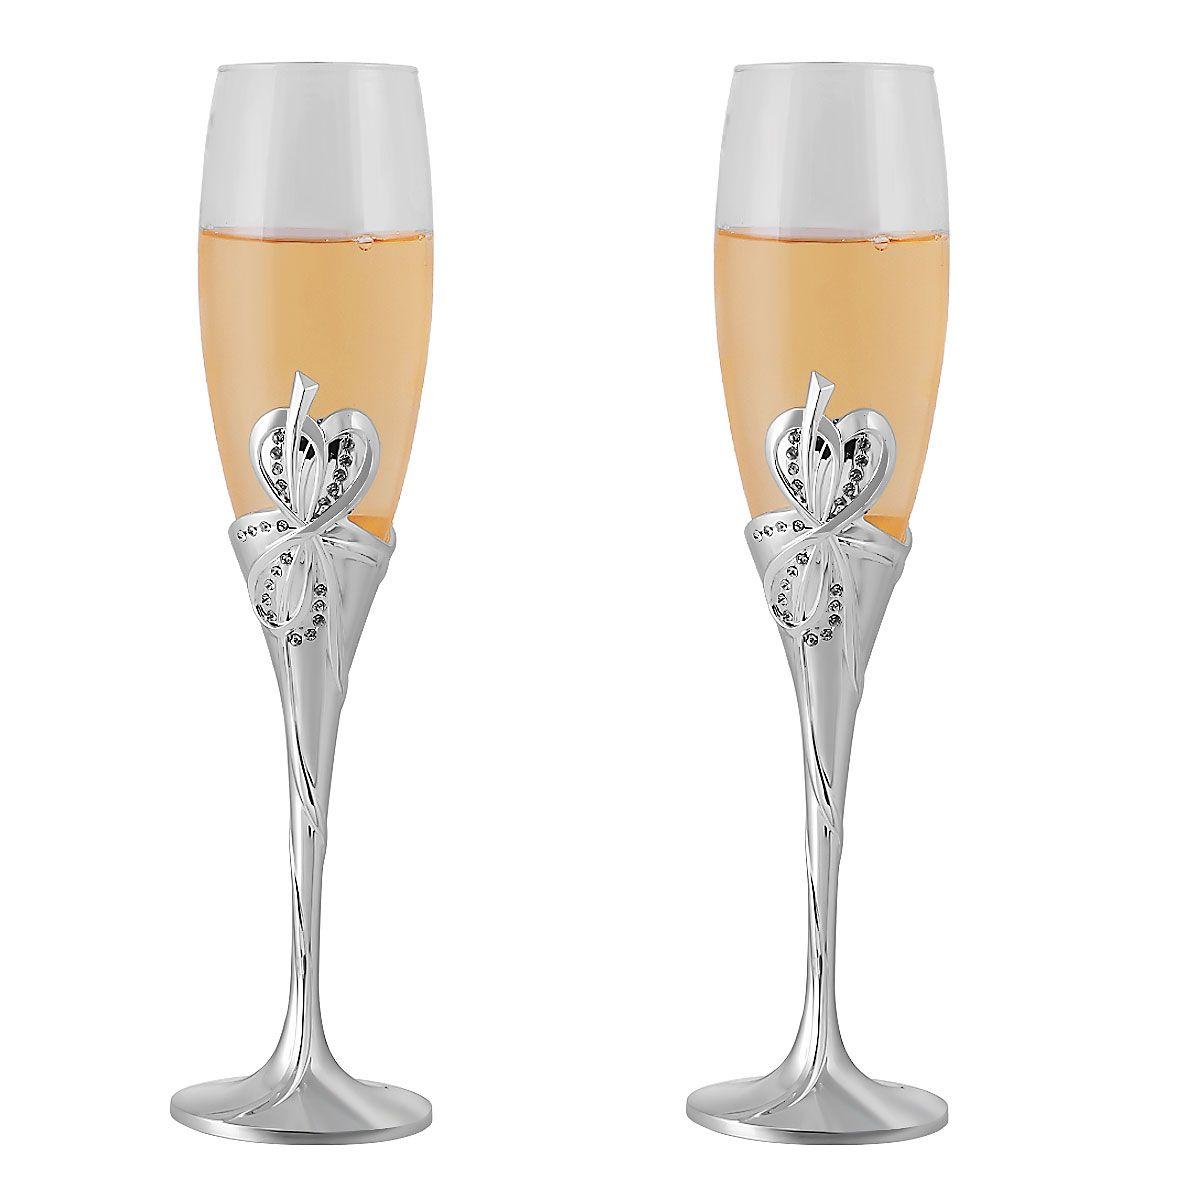 Multipurpose Personalized Champagne Flutes Personalized Champagne Flutes Lillian Vernon Personalized Champagne Flutes Walmart Personalized Champagne Flutes Wedding inspiration Personalized Champagne Flutes